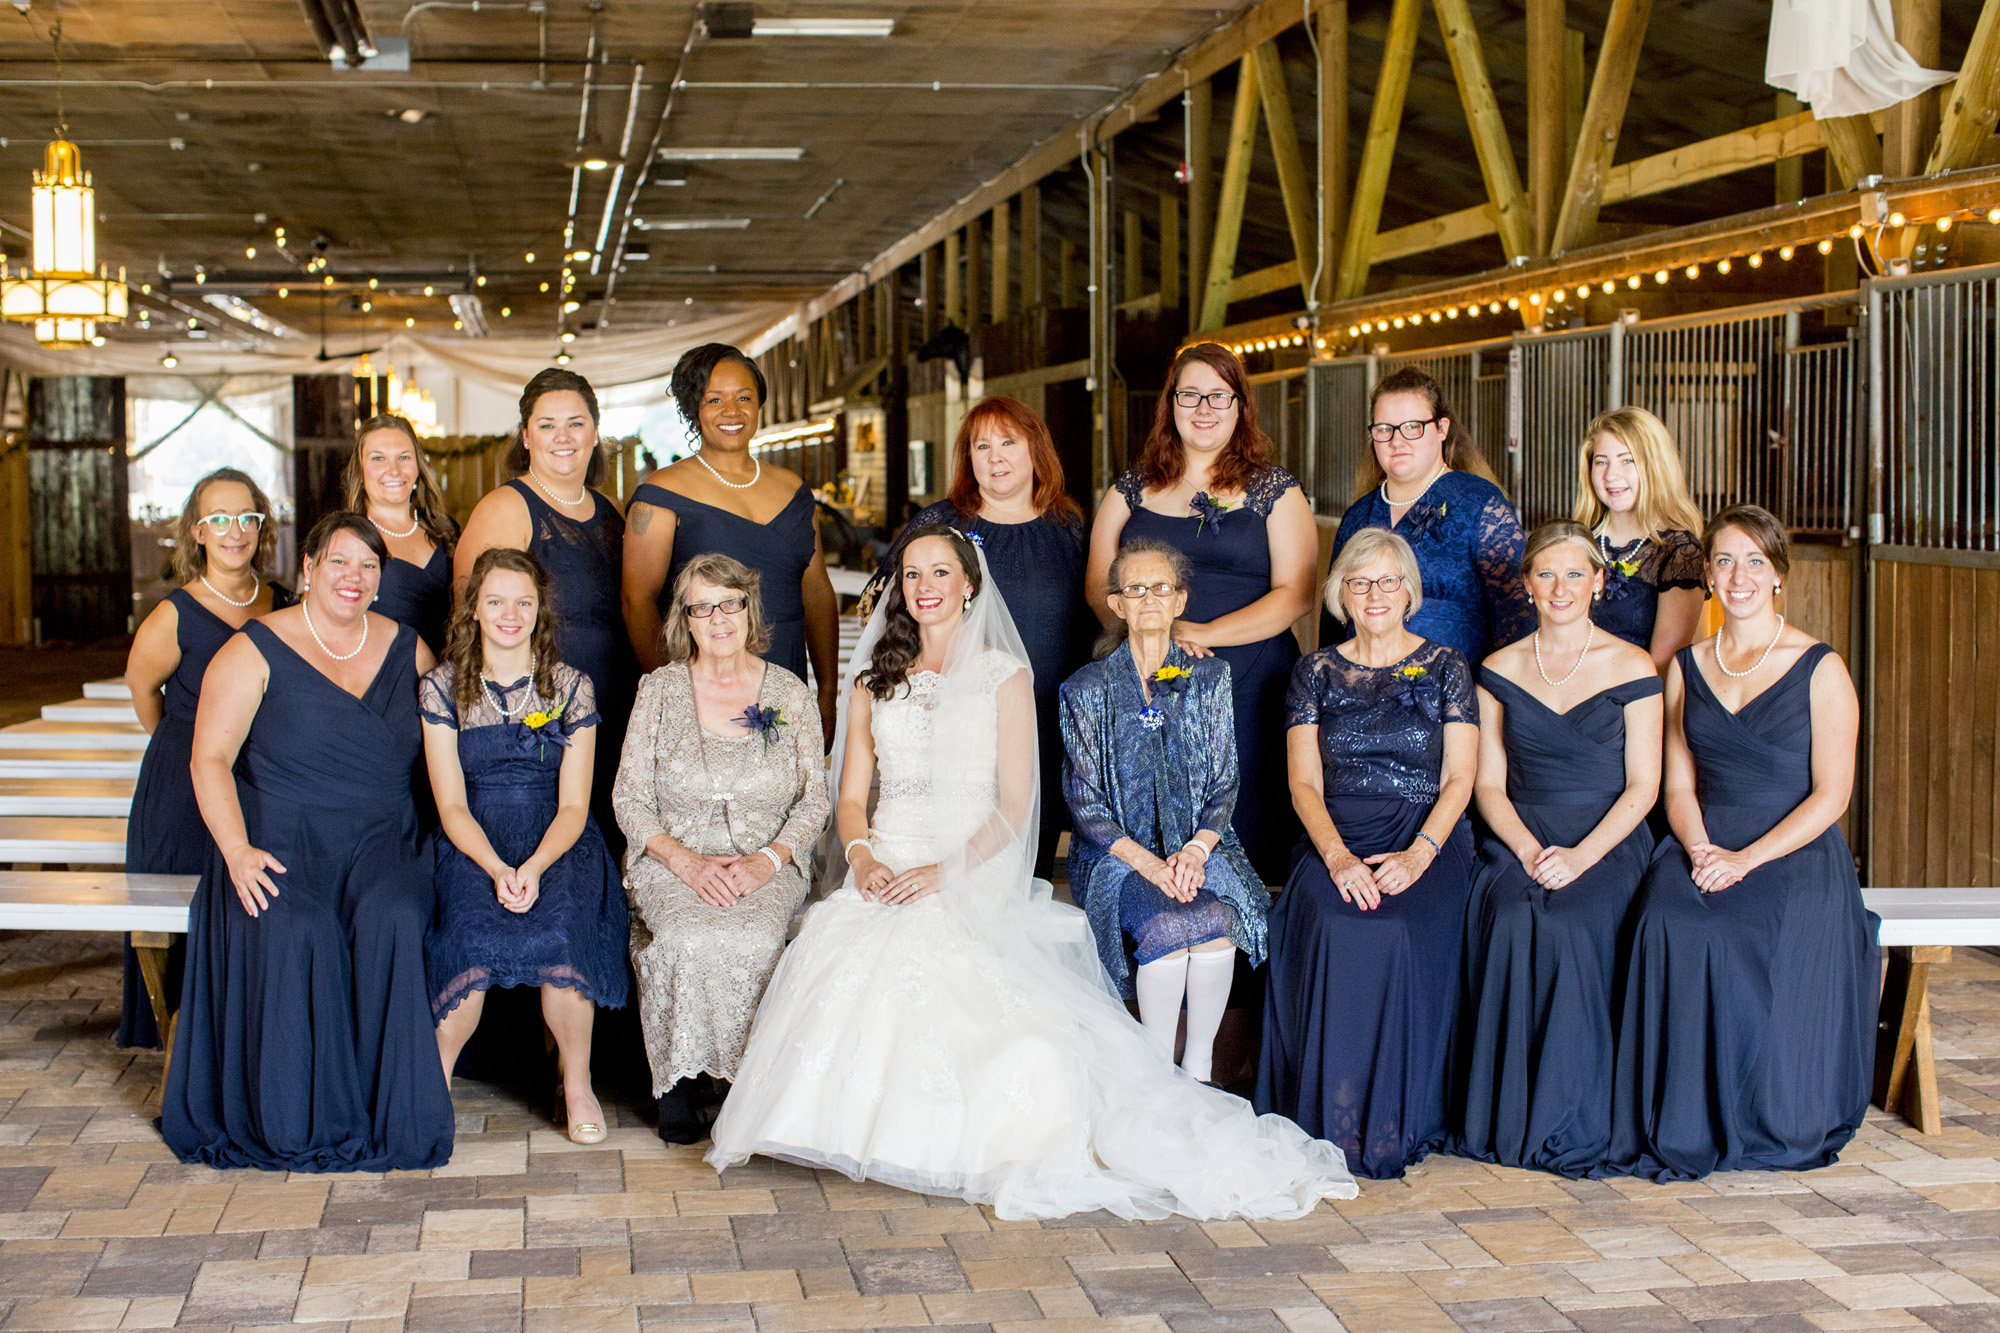 Seriously_Sabrina_Photography_Bowling_Green_Kentucky_Highland_Stables_Wedding_Wolff25.jpg